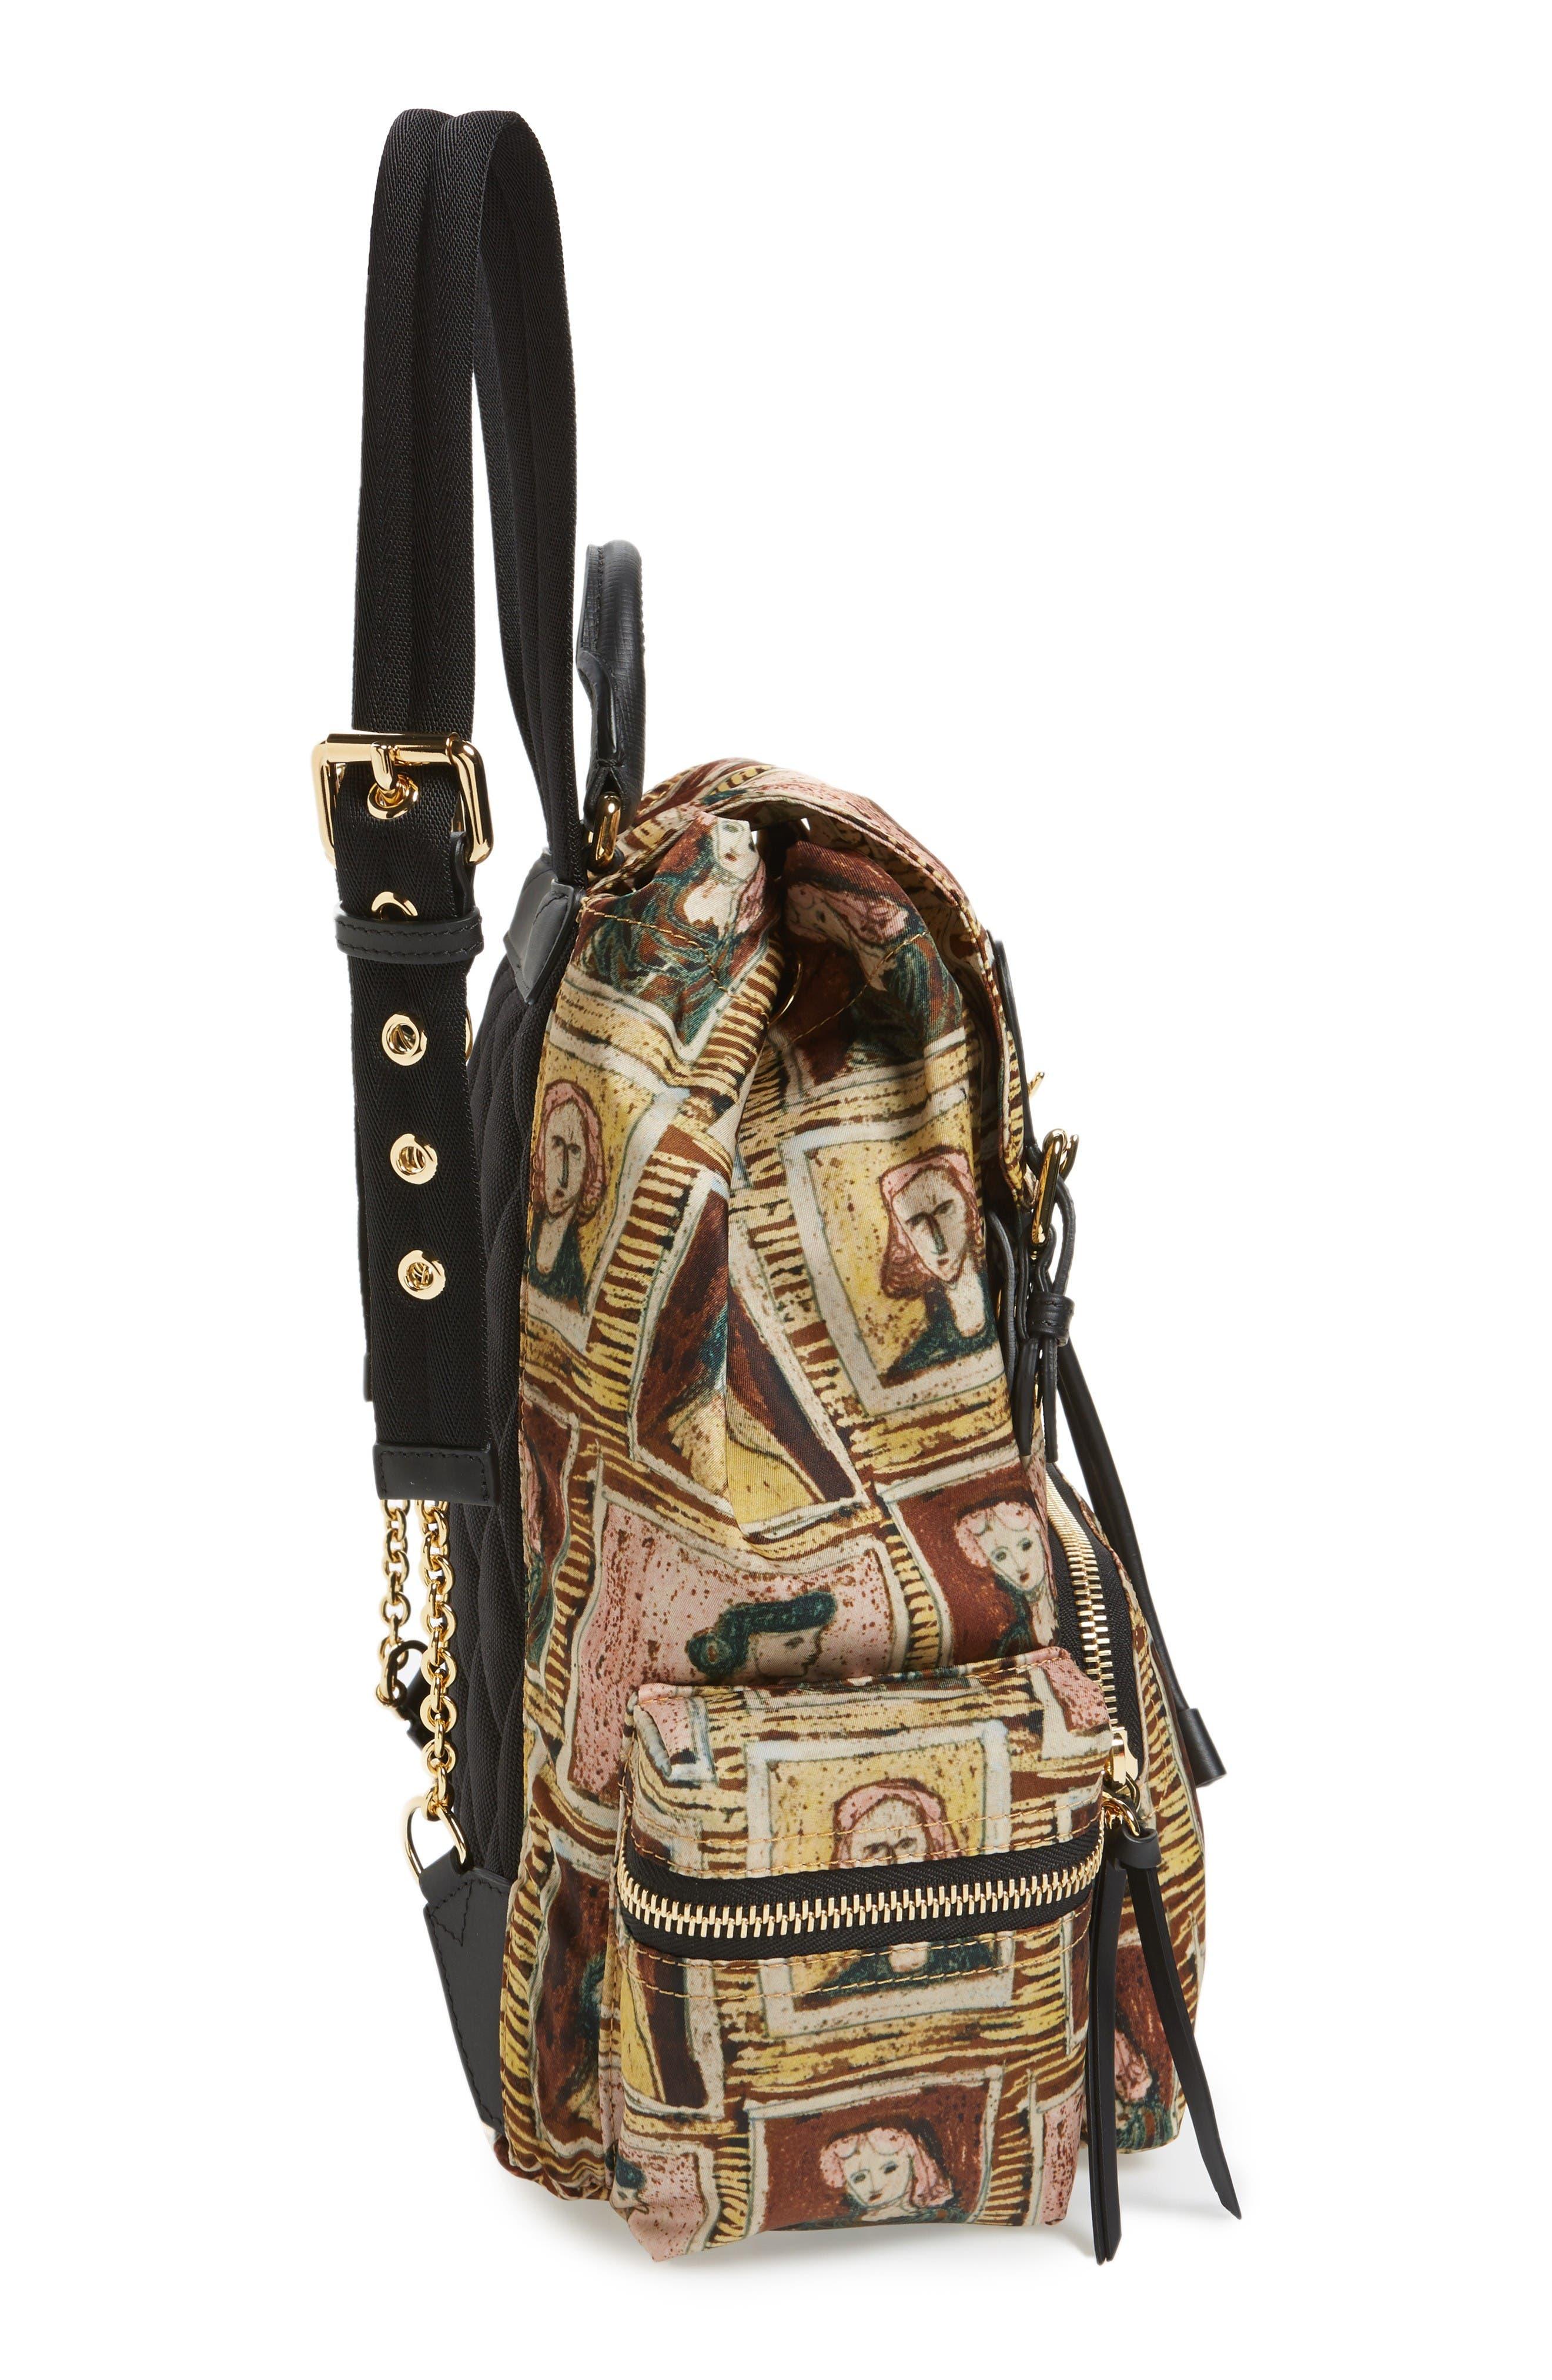 Medium Henrey Backpack,                             Alternate thumbnail 5, color,                             Umber Brown Multi